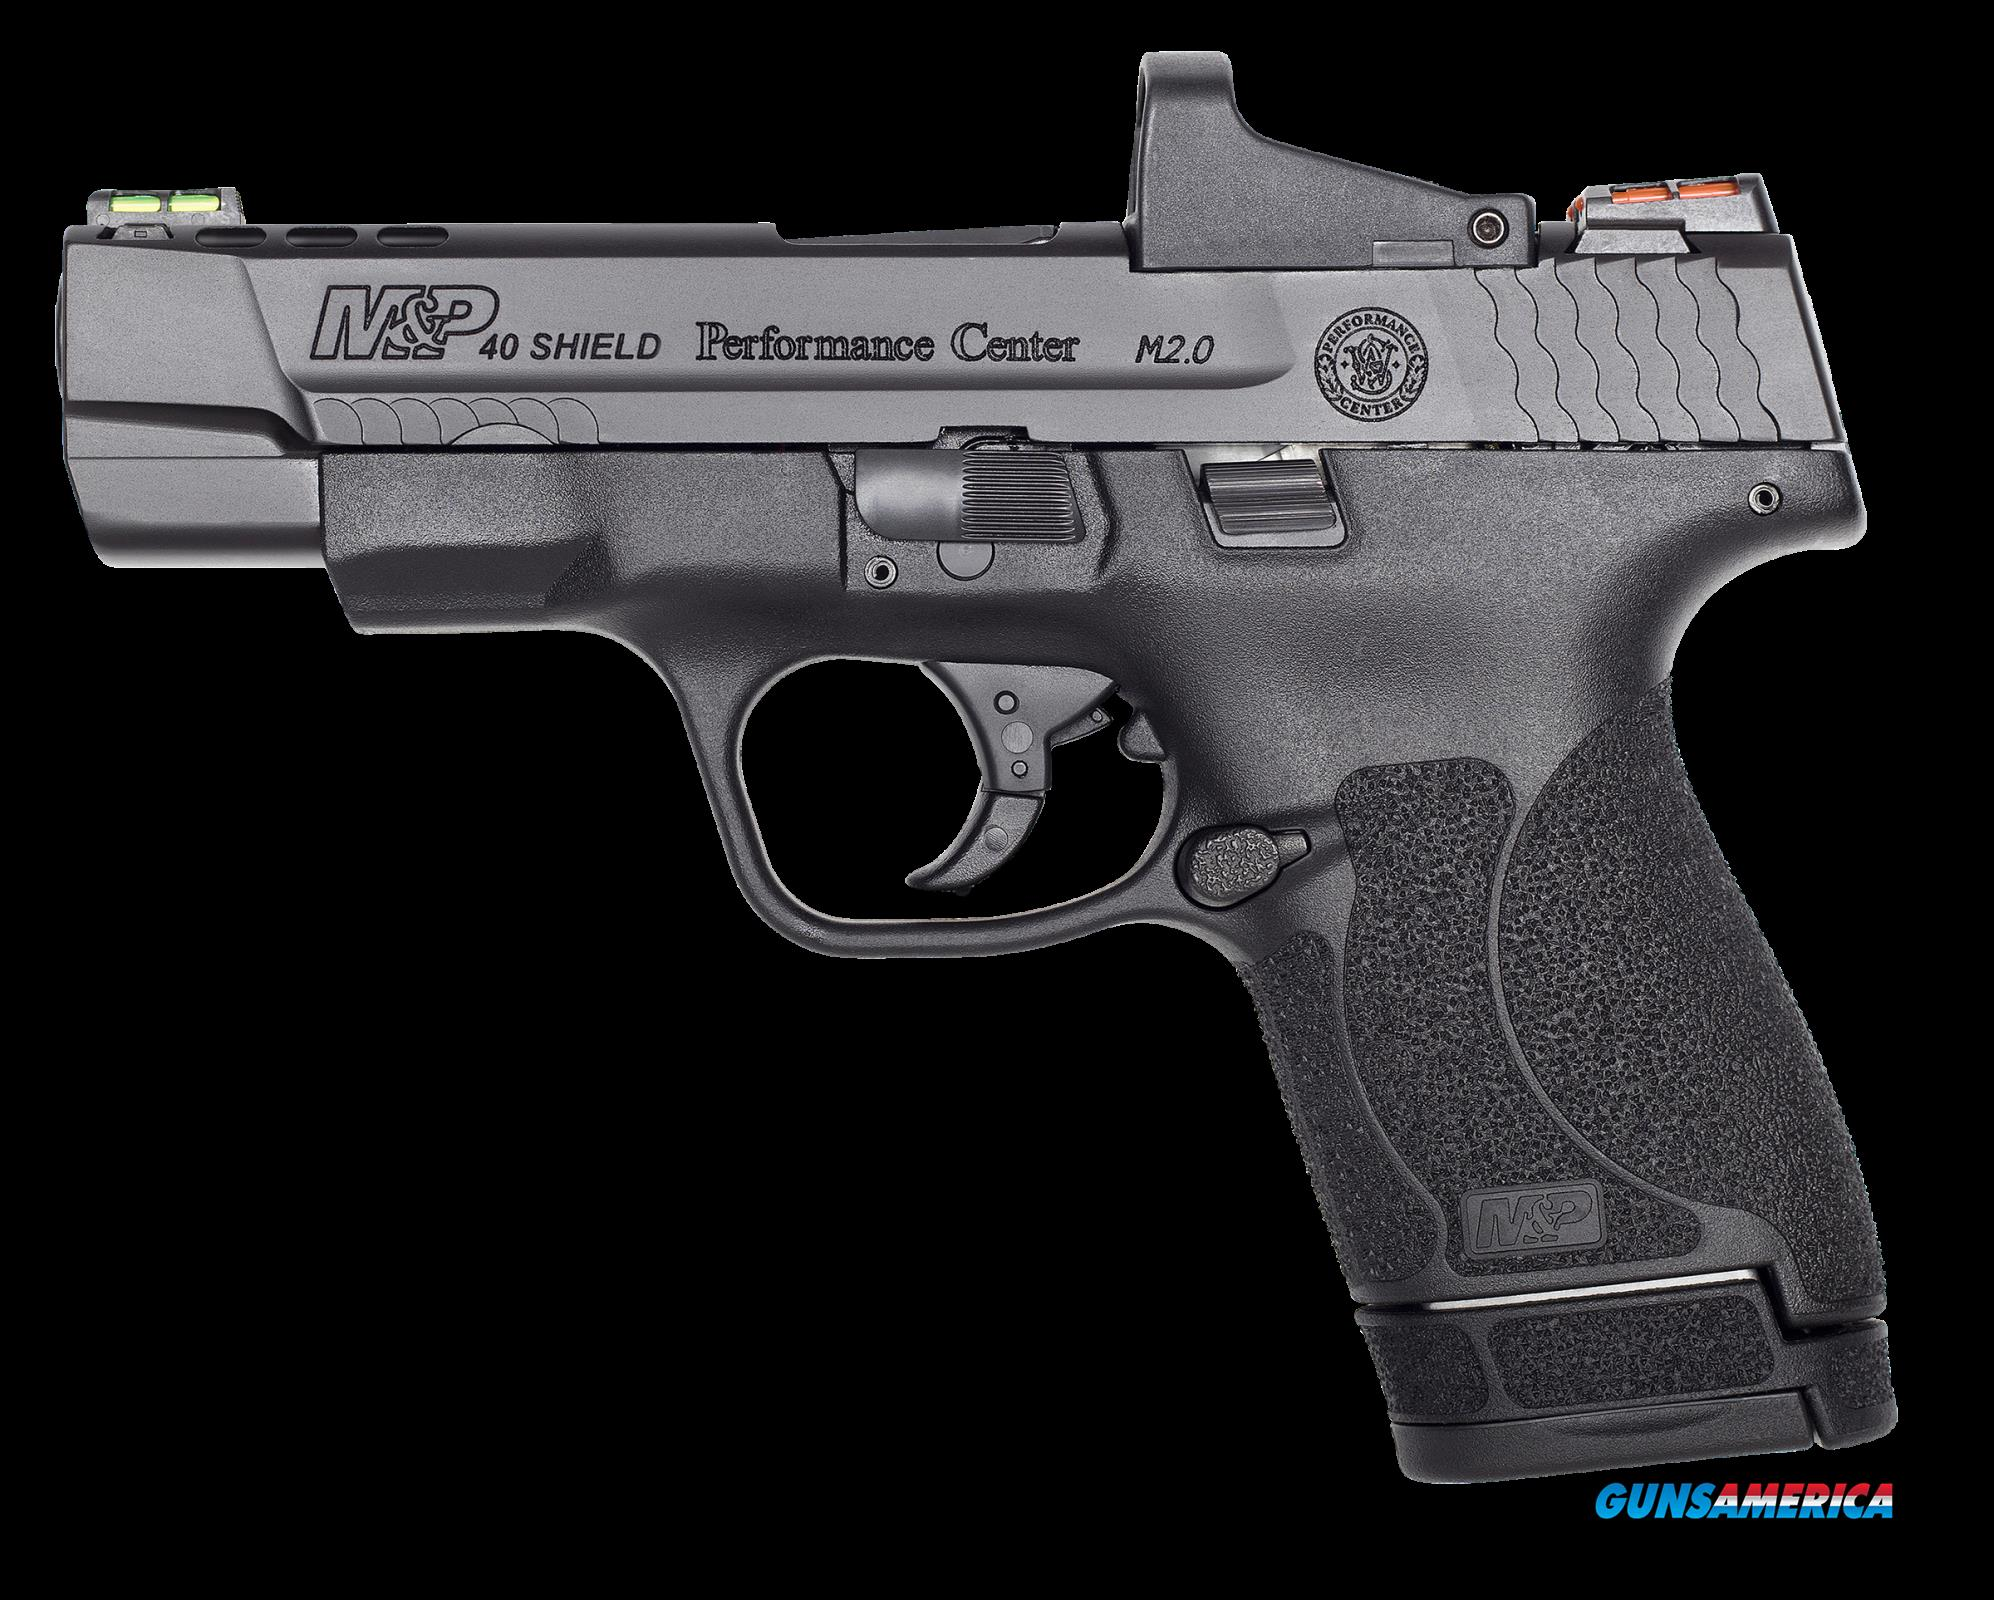 Smith & Wesson M&p 40, S&w M&p40shld  11798 Pfmc 40 2.0 4in Pt       7-6r  Guns > Pistols > 1911 Pistol Copies (non-Colt)